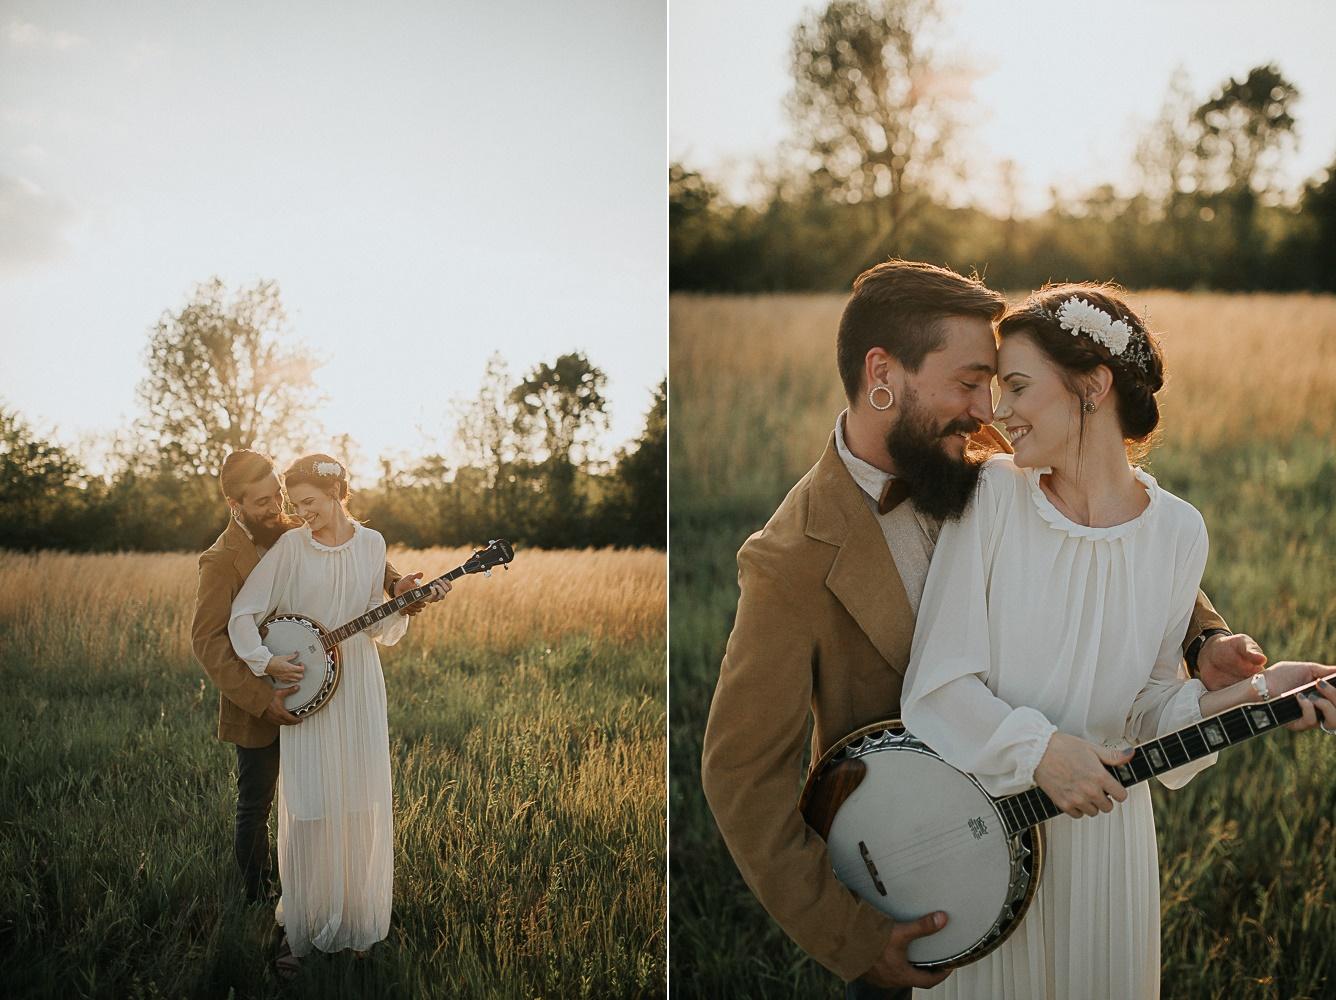 Cassie Cook Photography-Memphis TN-portrait and wedding photographer -7110-horz.jpg